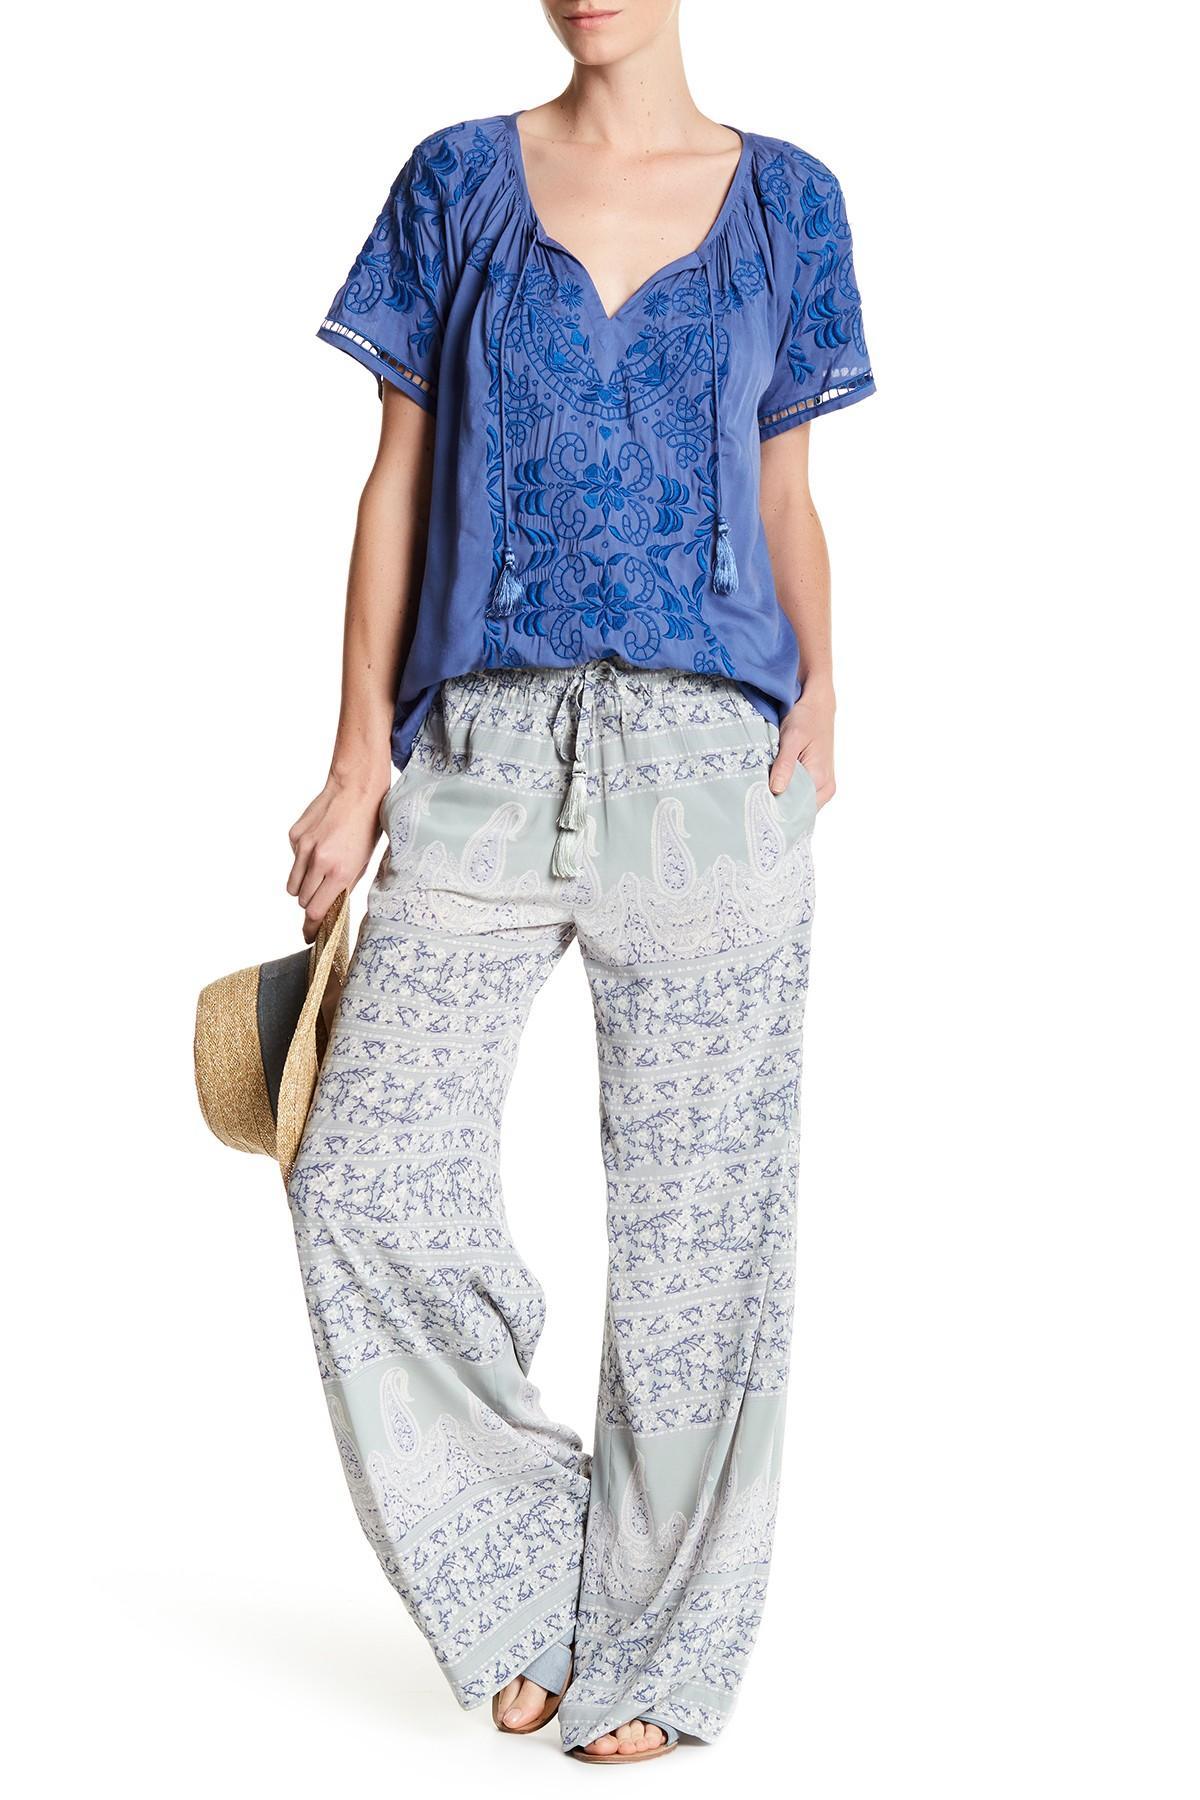 Lyst Calypso St Barth Bironia Silk Blend Pant In Blue